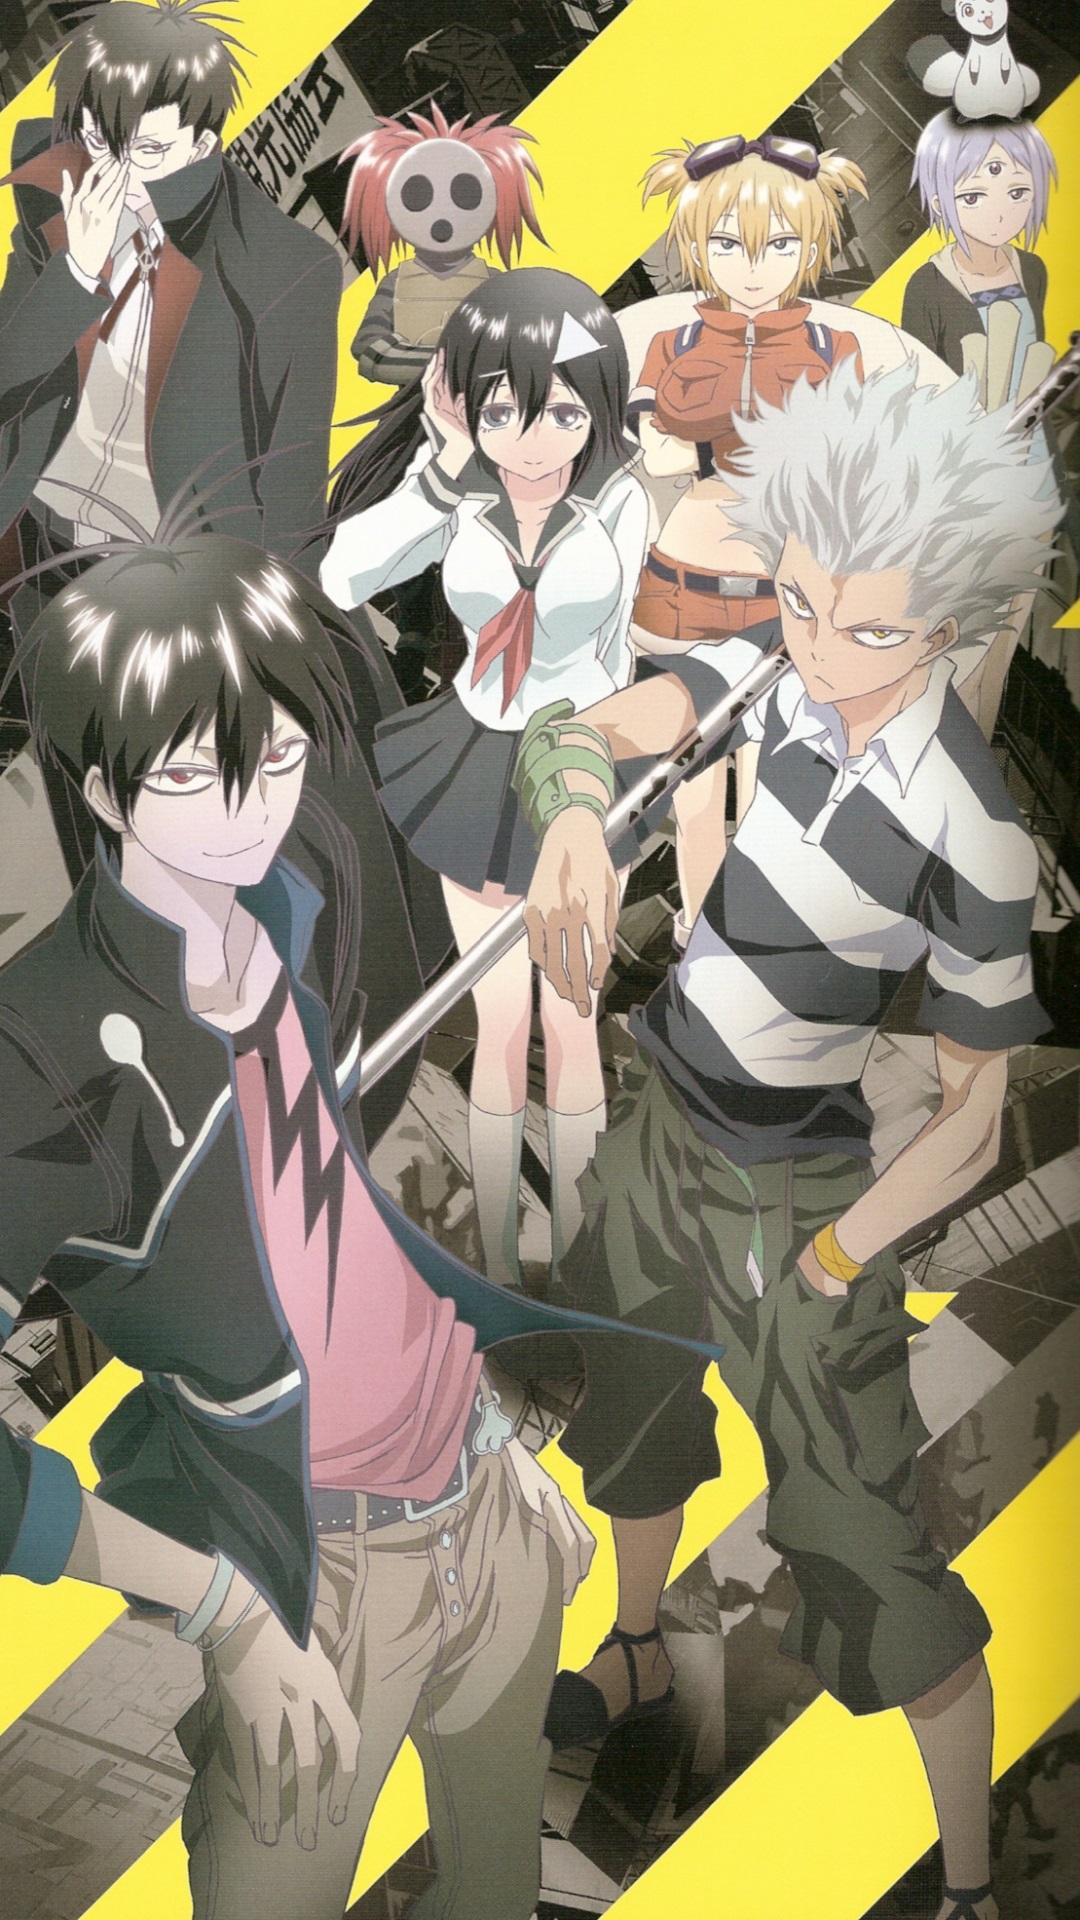 Image Result For Anime Wallpaper Rss